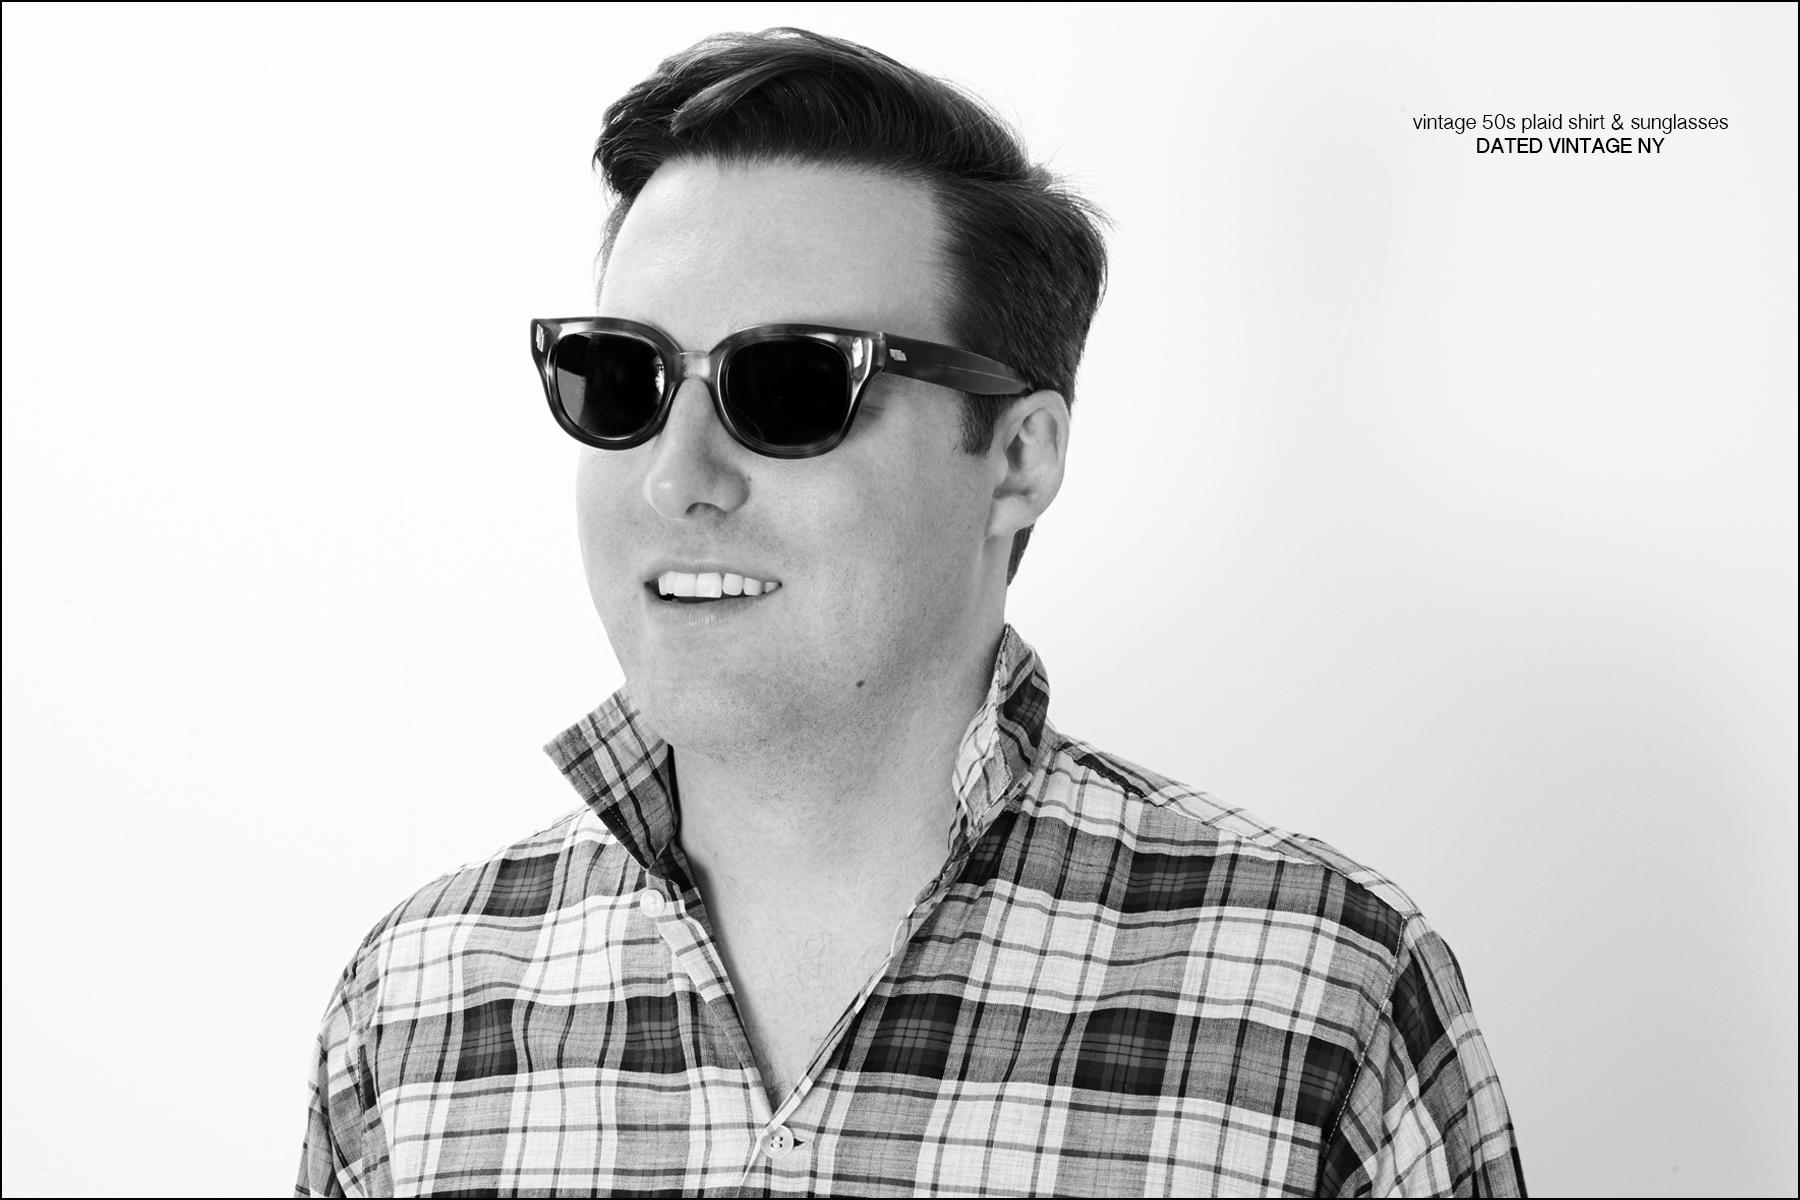 California musician Nick Watherhouse photographed in New York by Alexander Thompson for Ponyboy magazine.